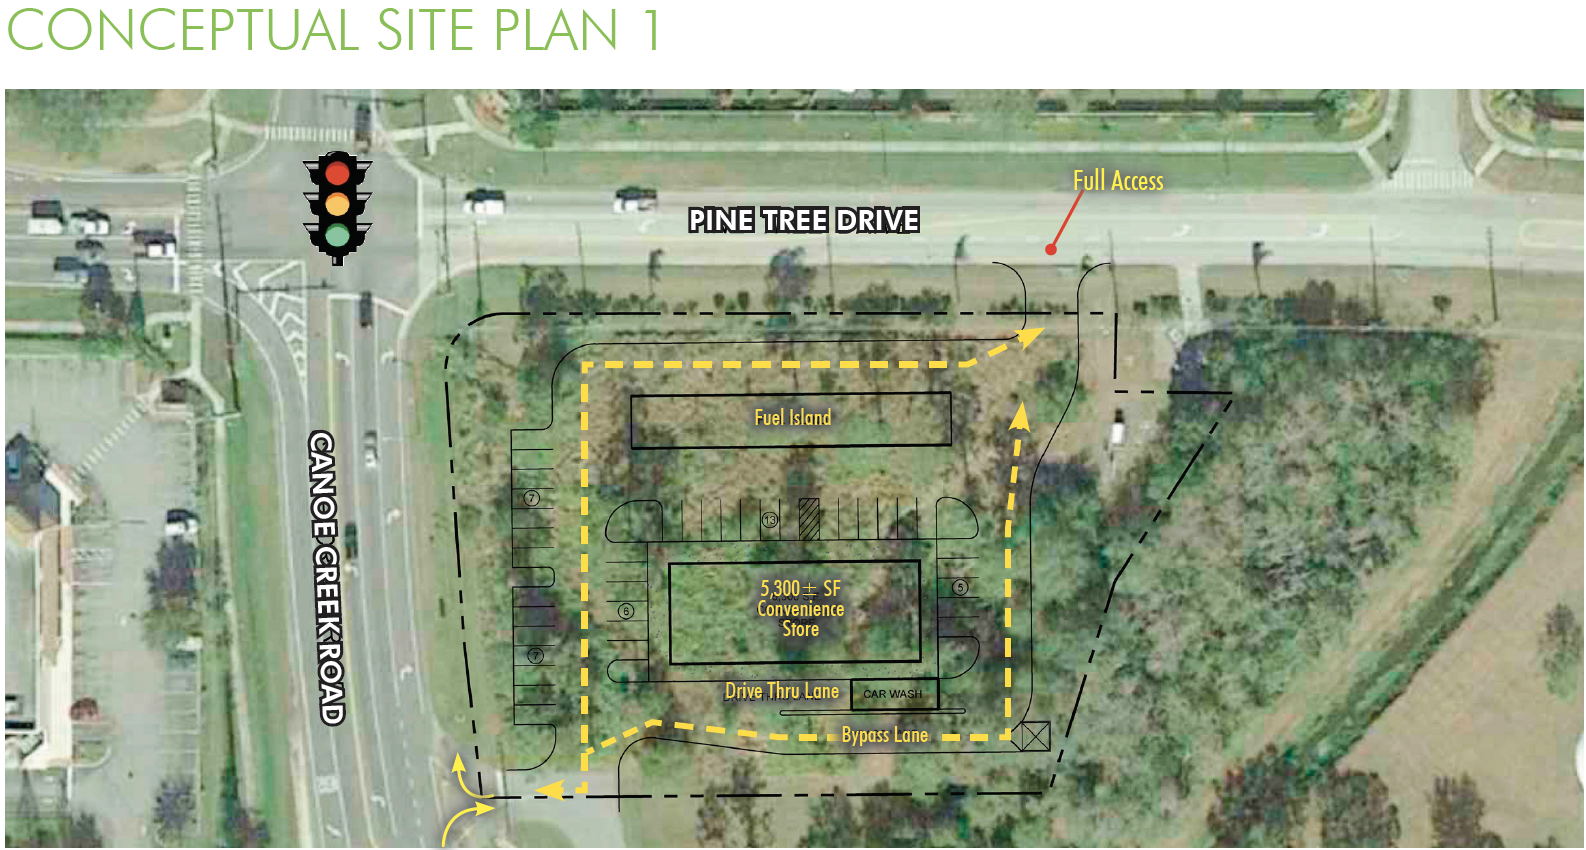 St. Cloud Orlando Real Estate Development